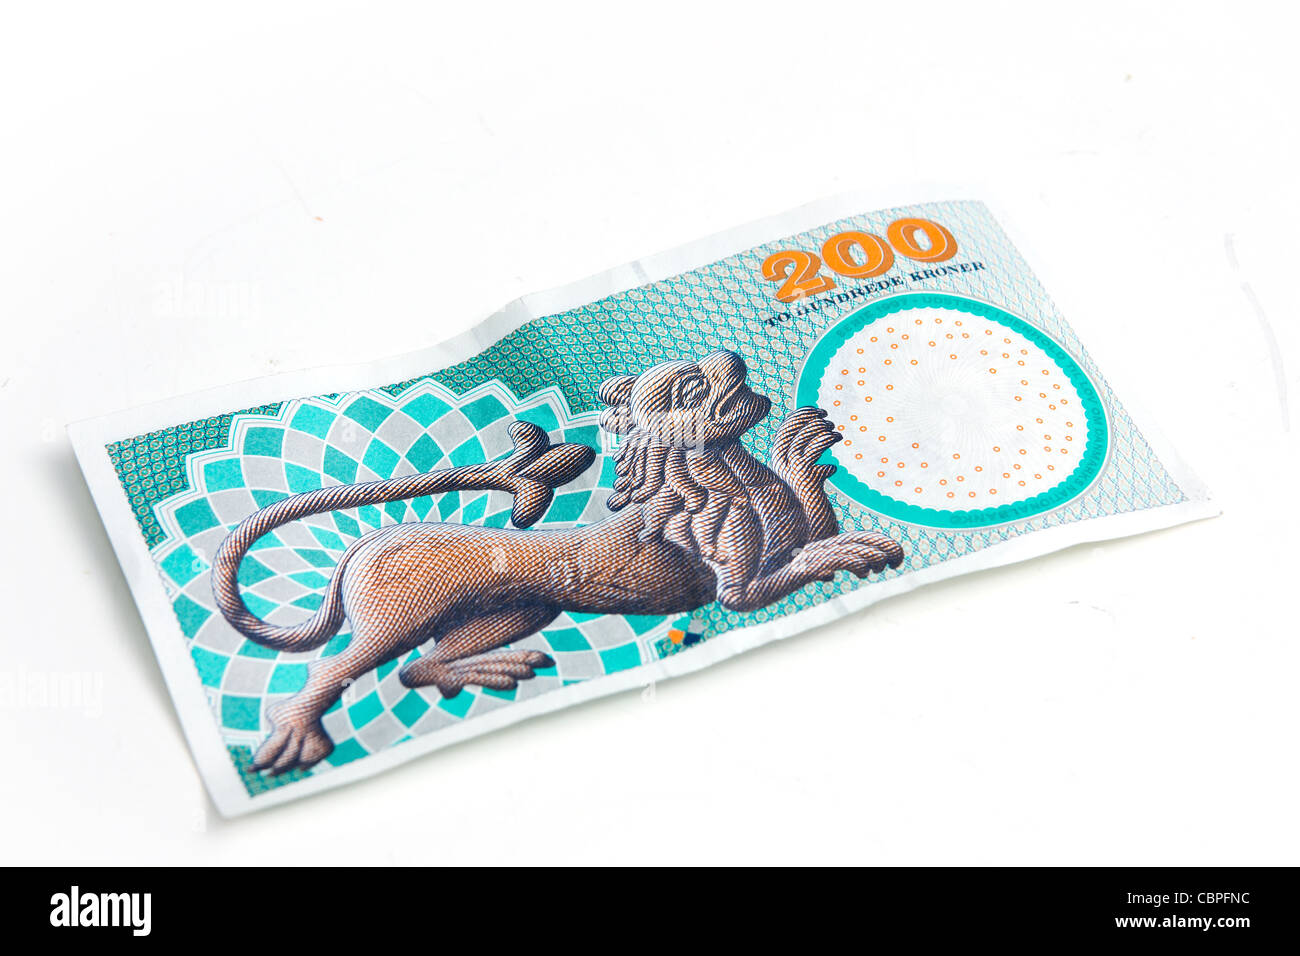 Danish two hundred bill - Stock Image